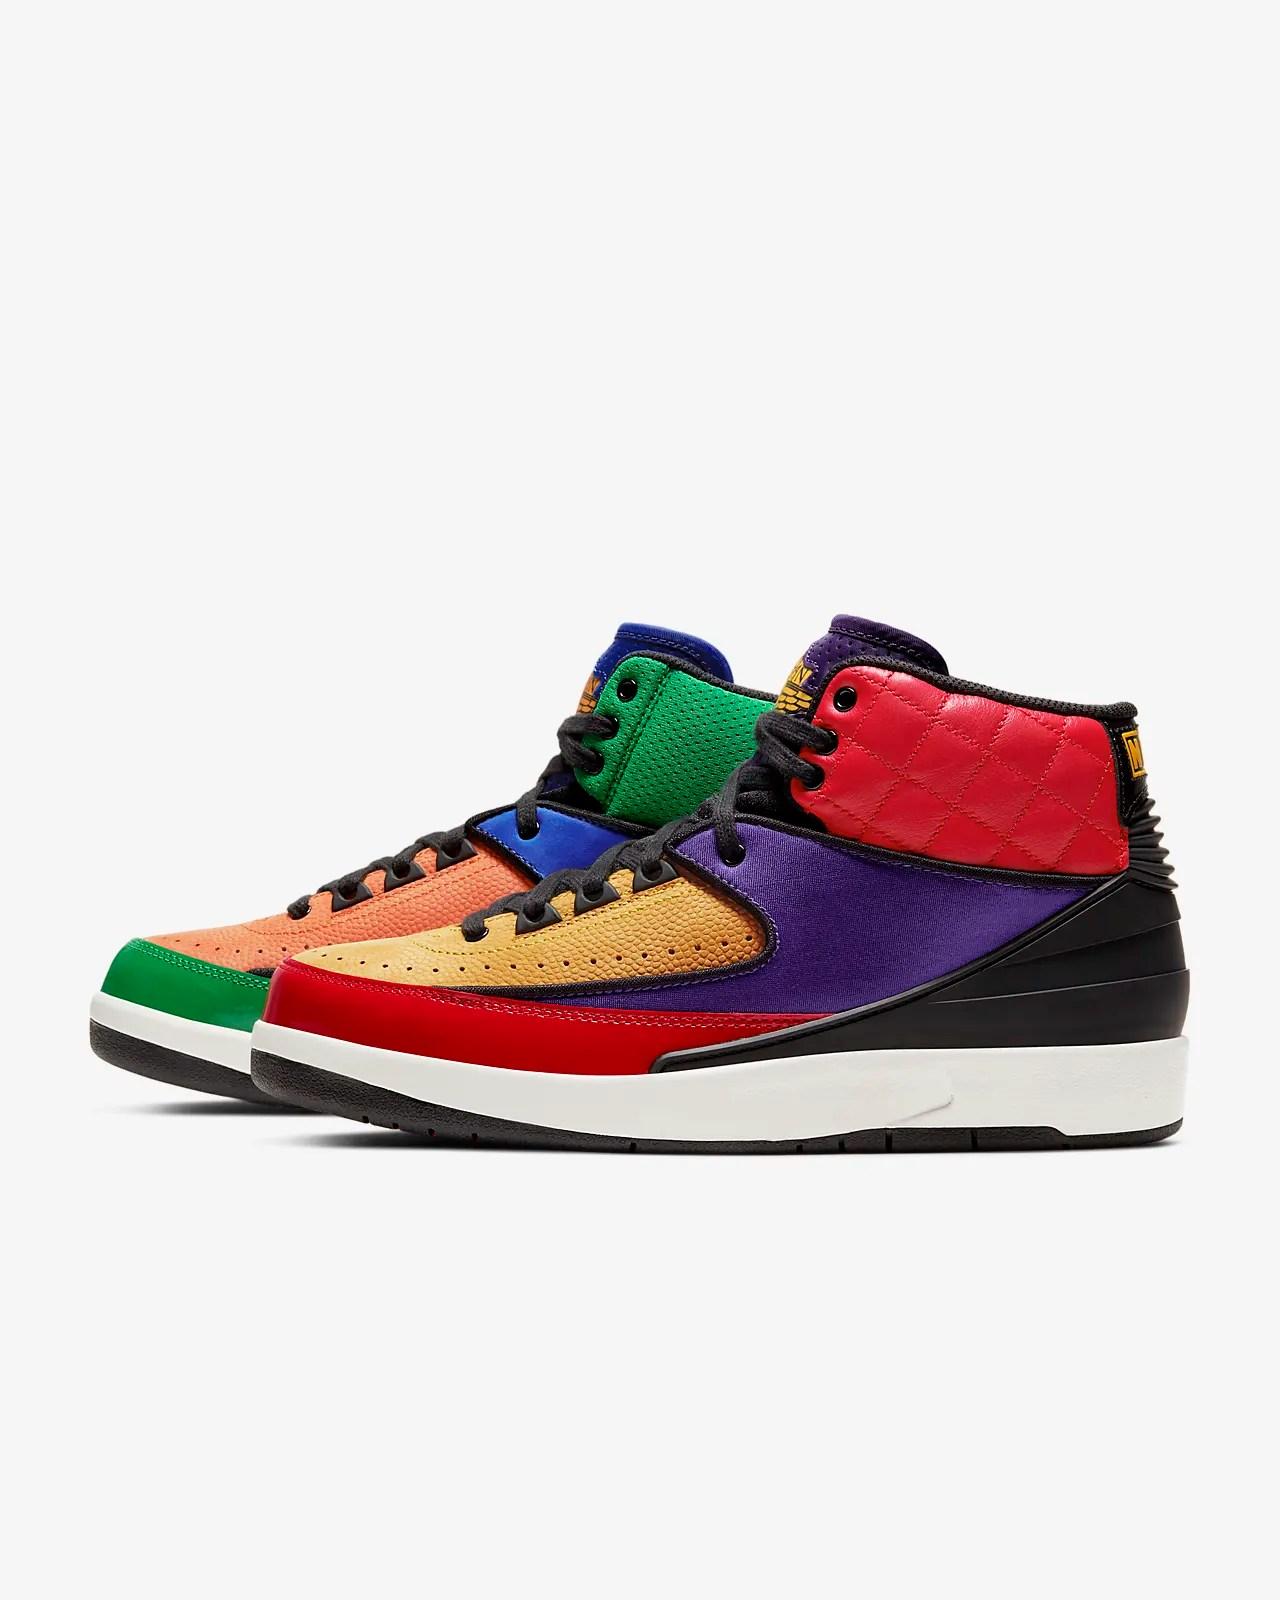 Do Air Jordans Run Big Or Small : jordans, small, Jordan, Retro, Small, Cheap, Online